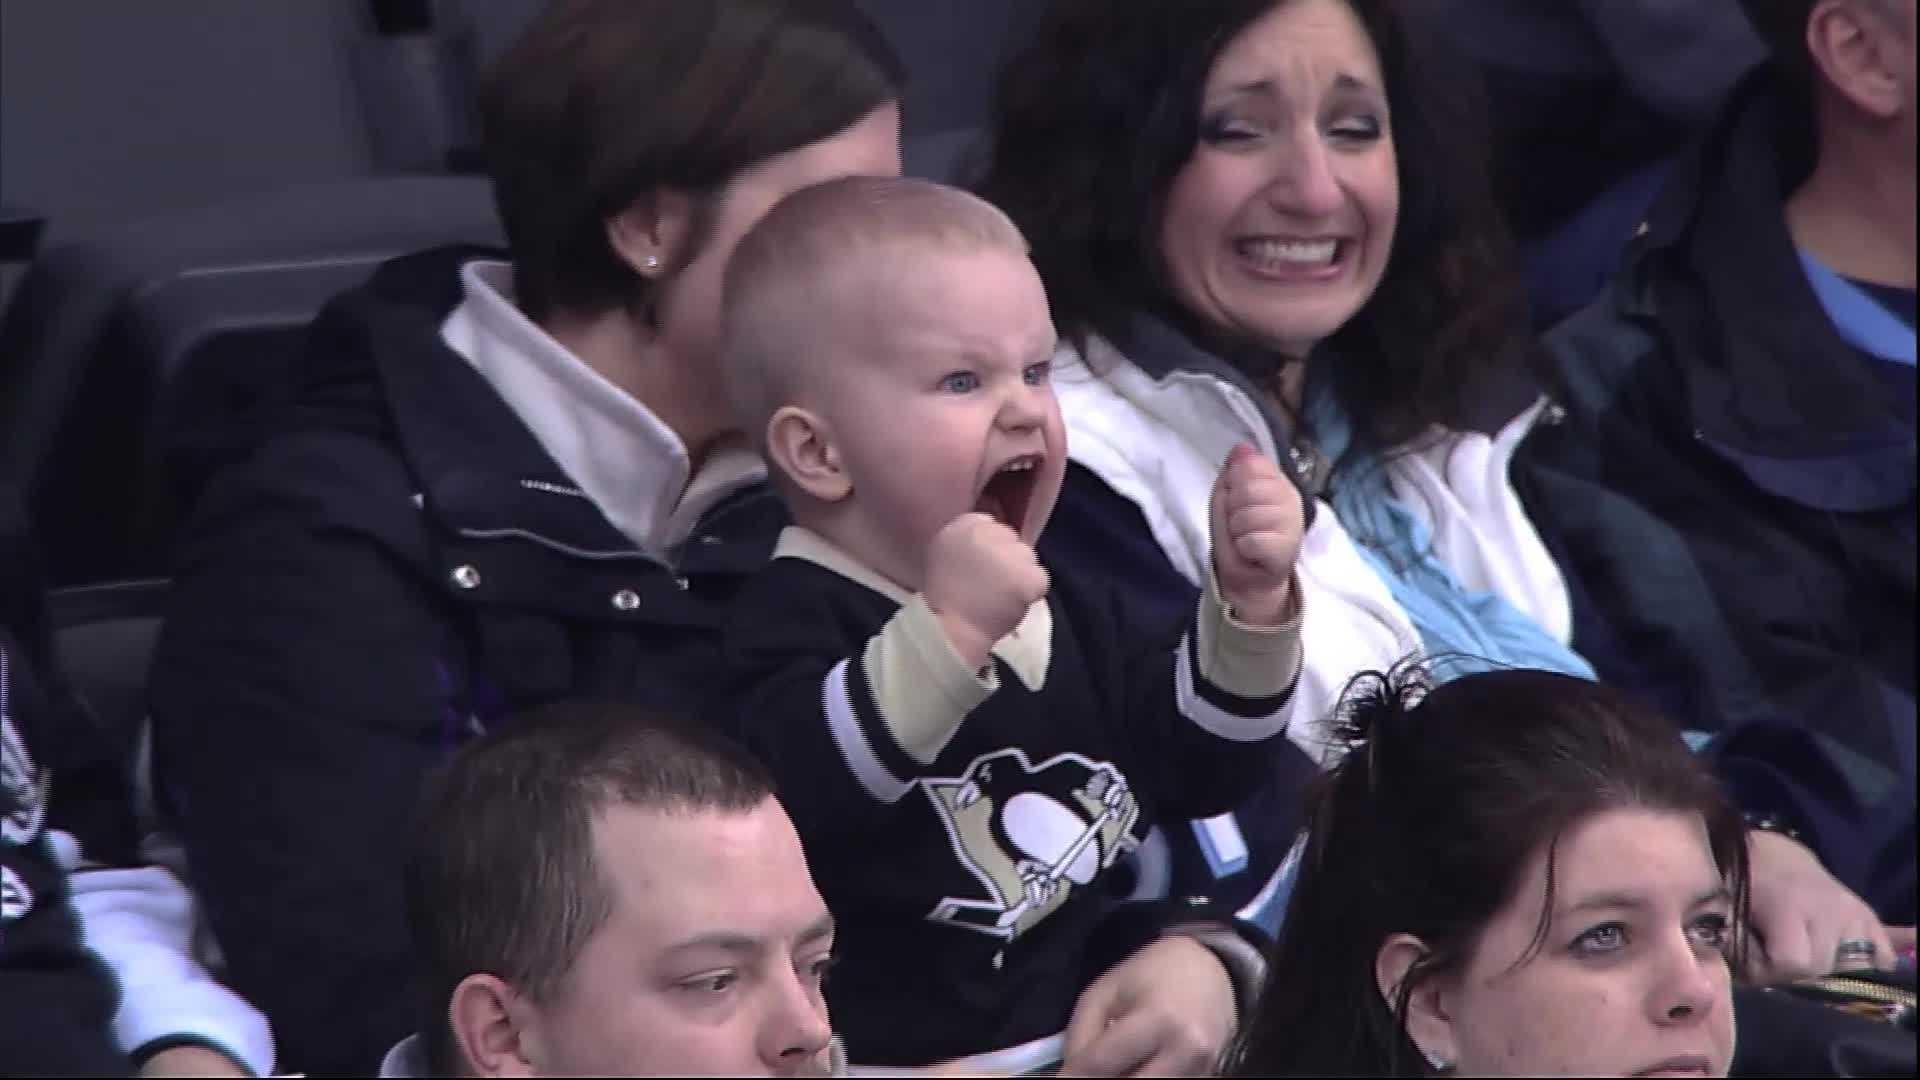 img-penguins screaming baby